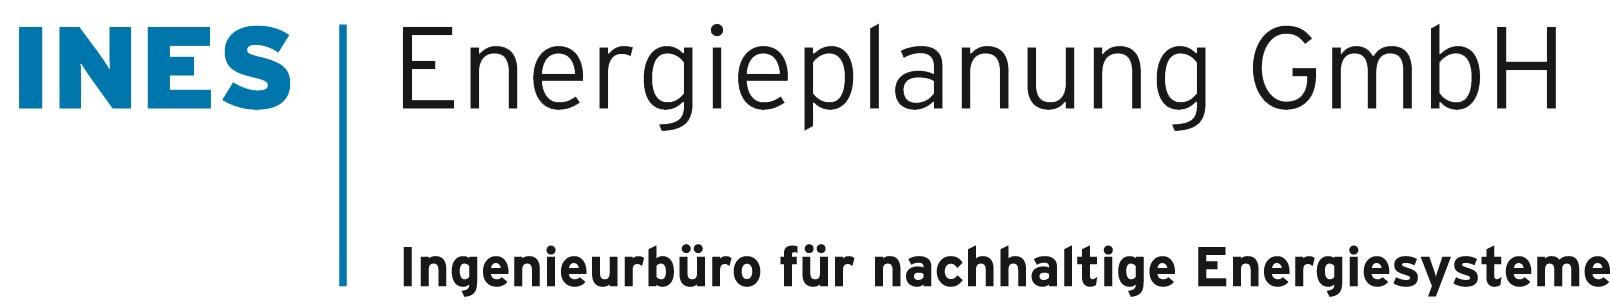 INES Energieplanung GmbH